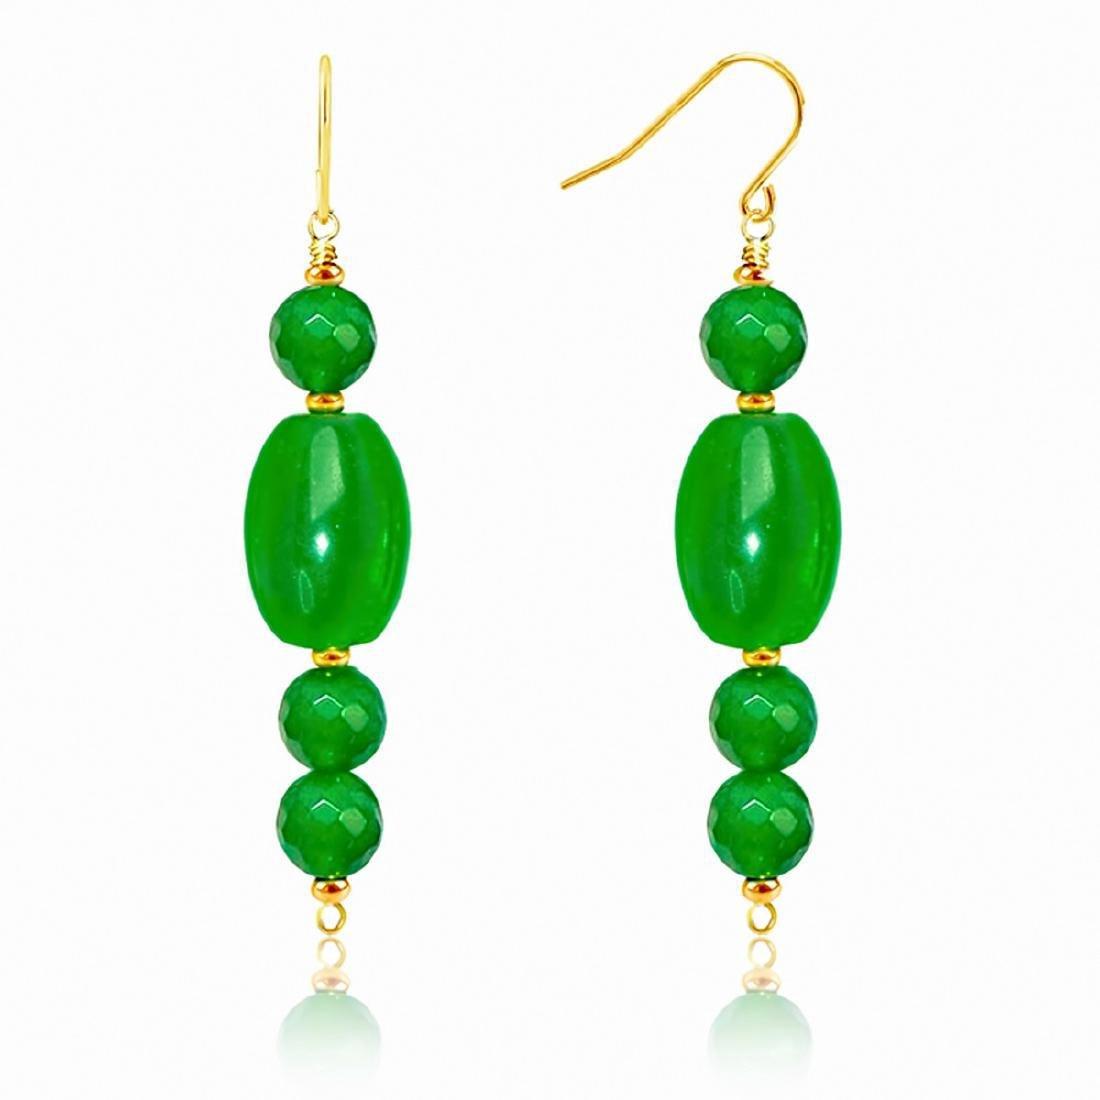 14kt Gold Drop Imperial Jade Earrings